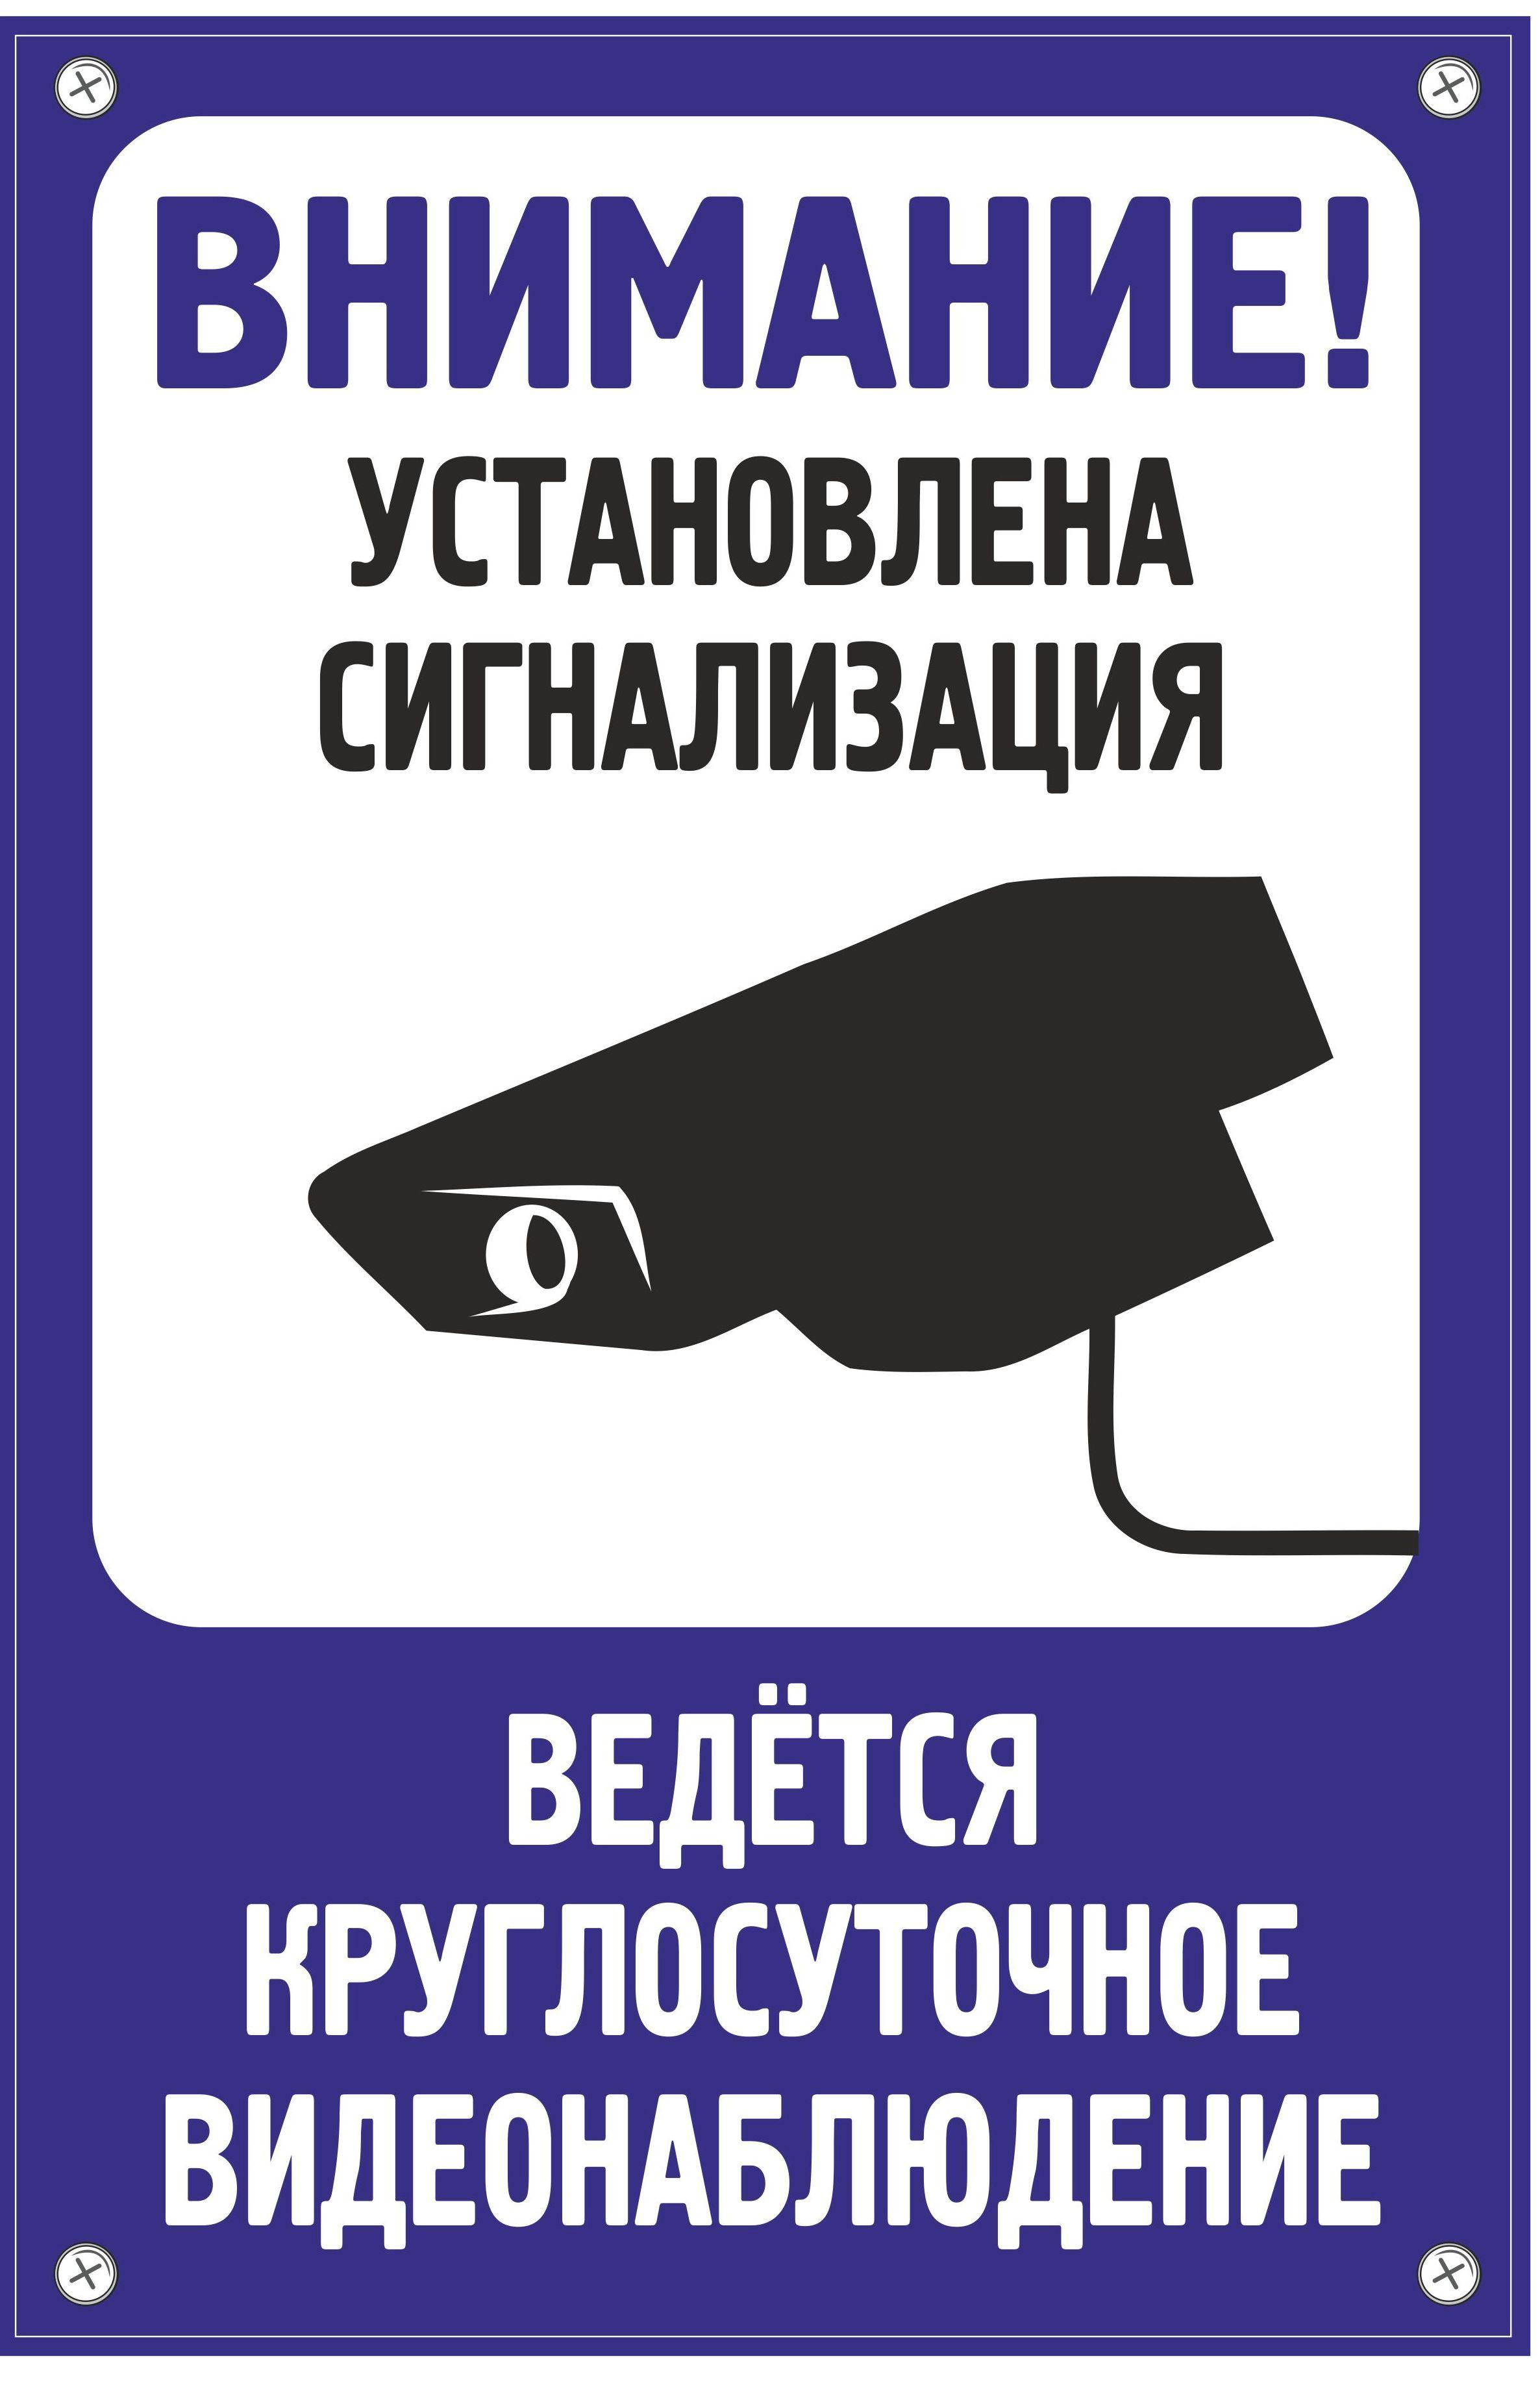 Табличка TPS 008 Сигнализация, пластик 3 мм,30*19,5 см табличка tps 004 собака без привязи пластик 3 мм 30 19 5 см